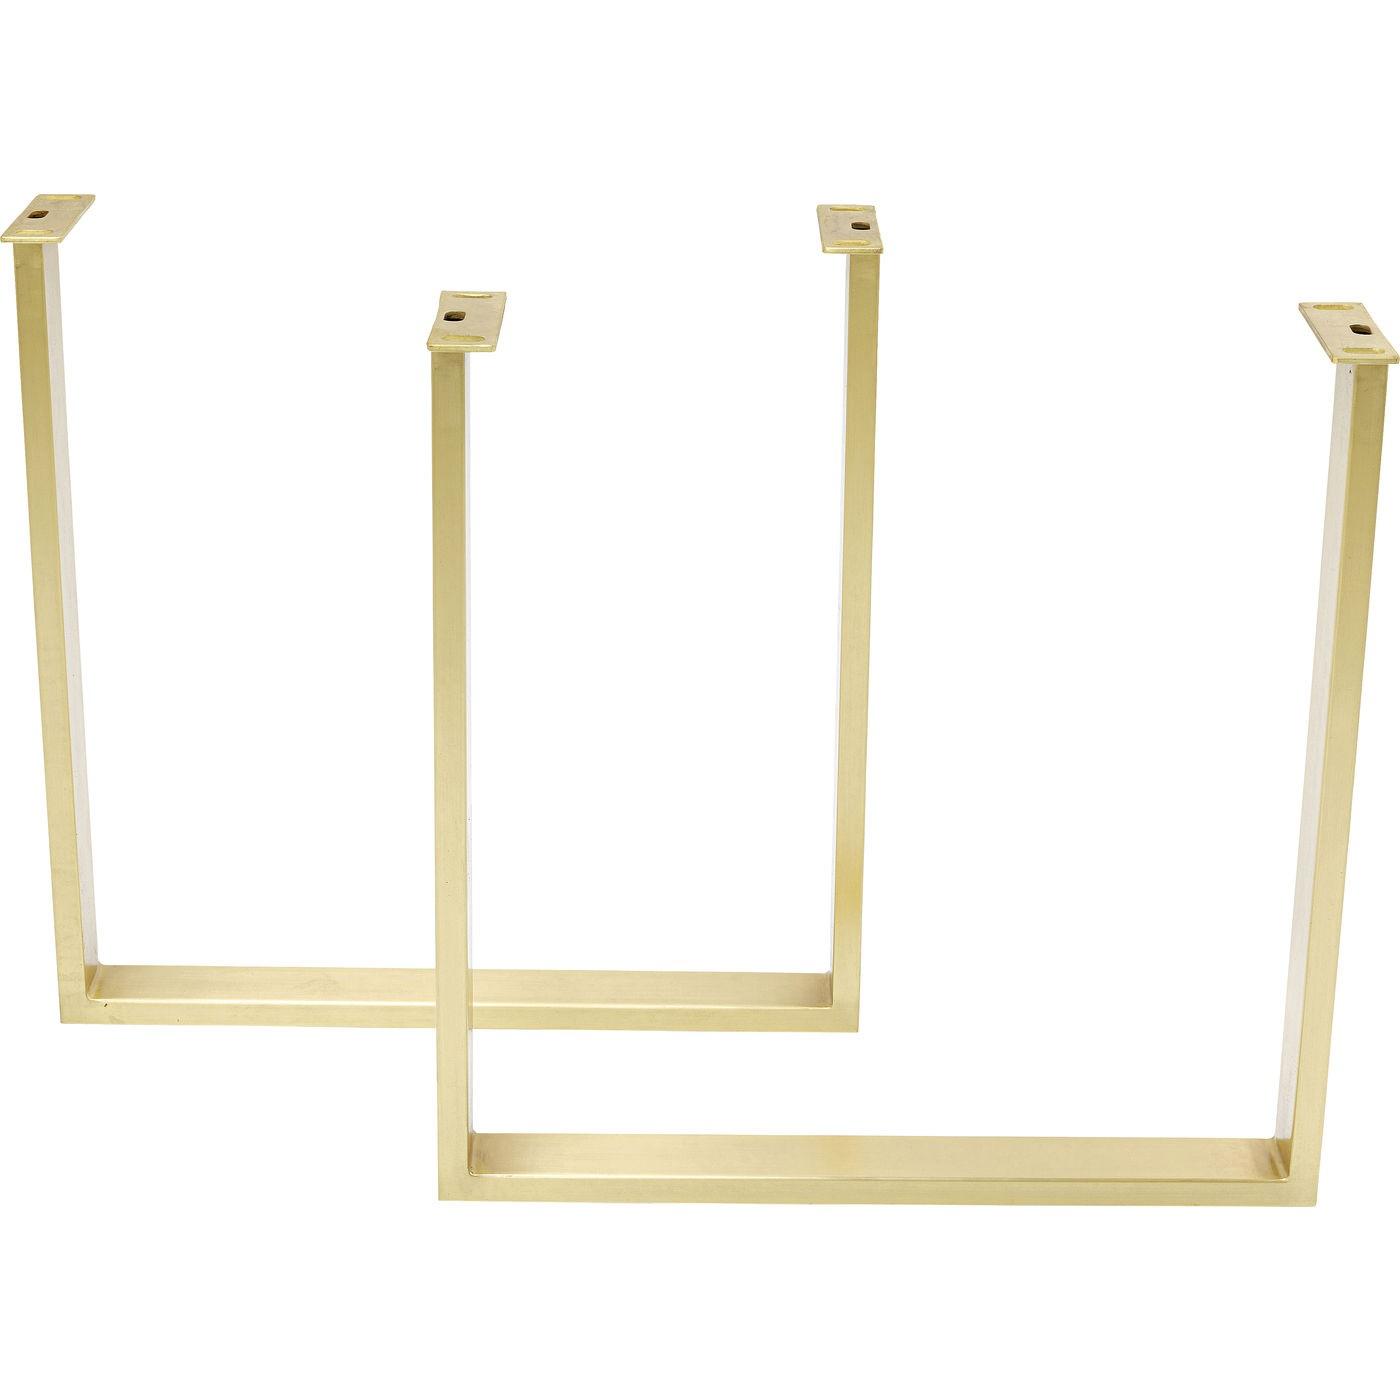 Table Jackie chêne laiton Kare Design Taille - 180x90cm